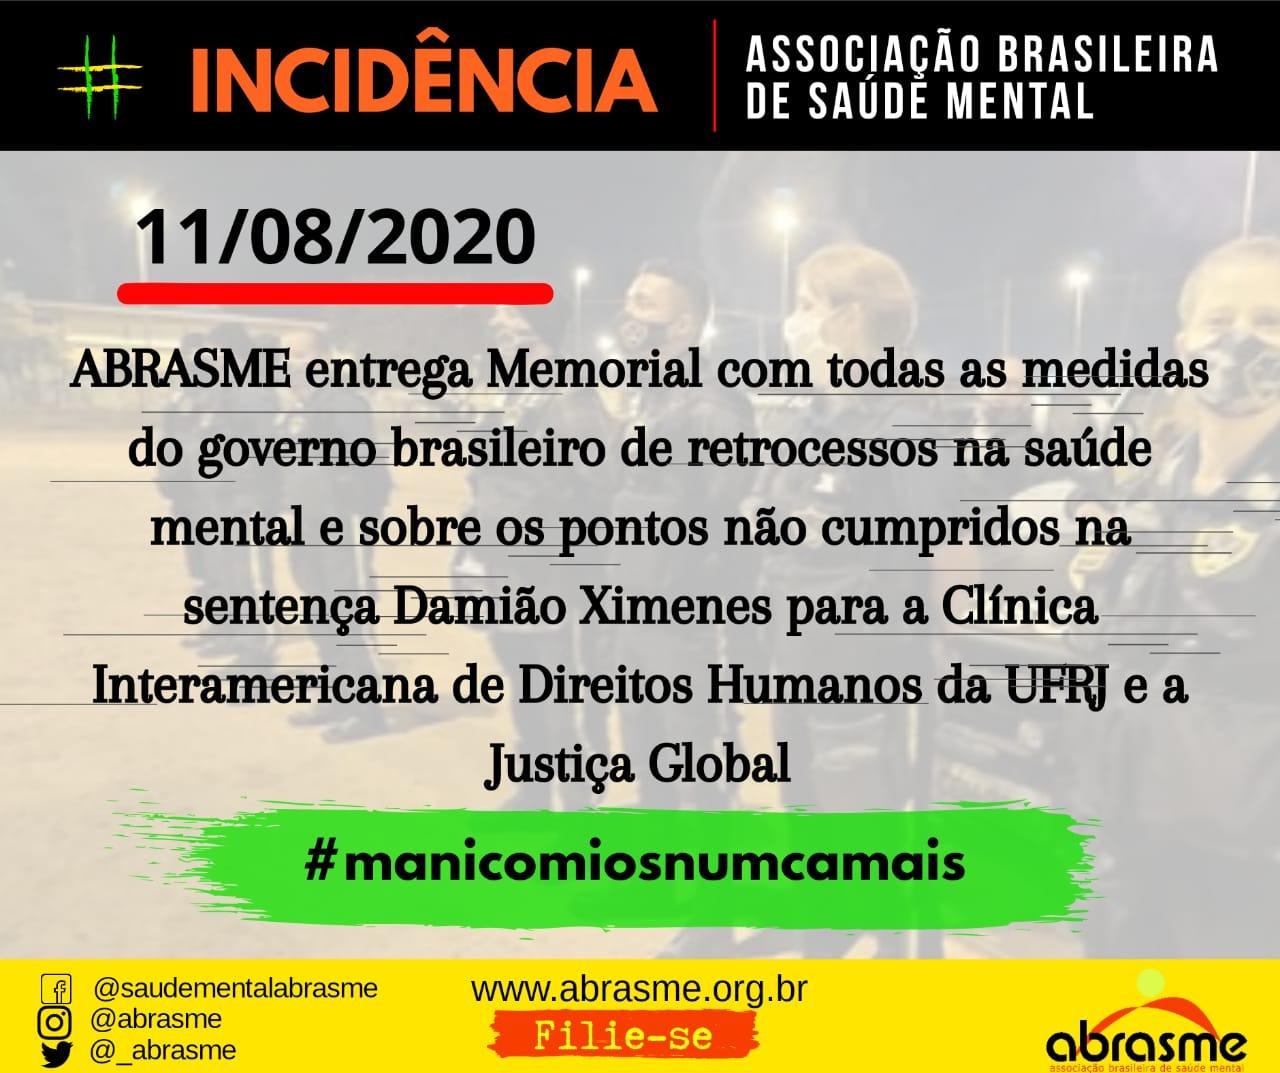 ABRASME entrega Memorial sobre retrocessos do governo brasileiro na pauta de Saúde Mental e Drogas